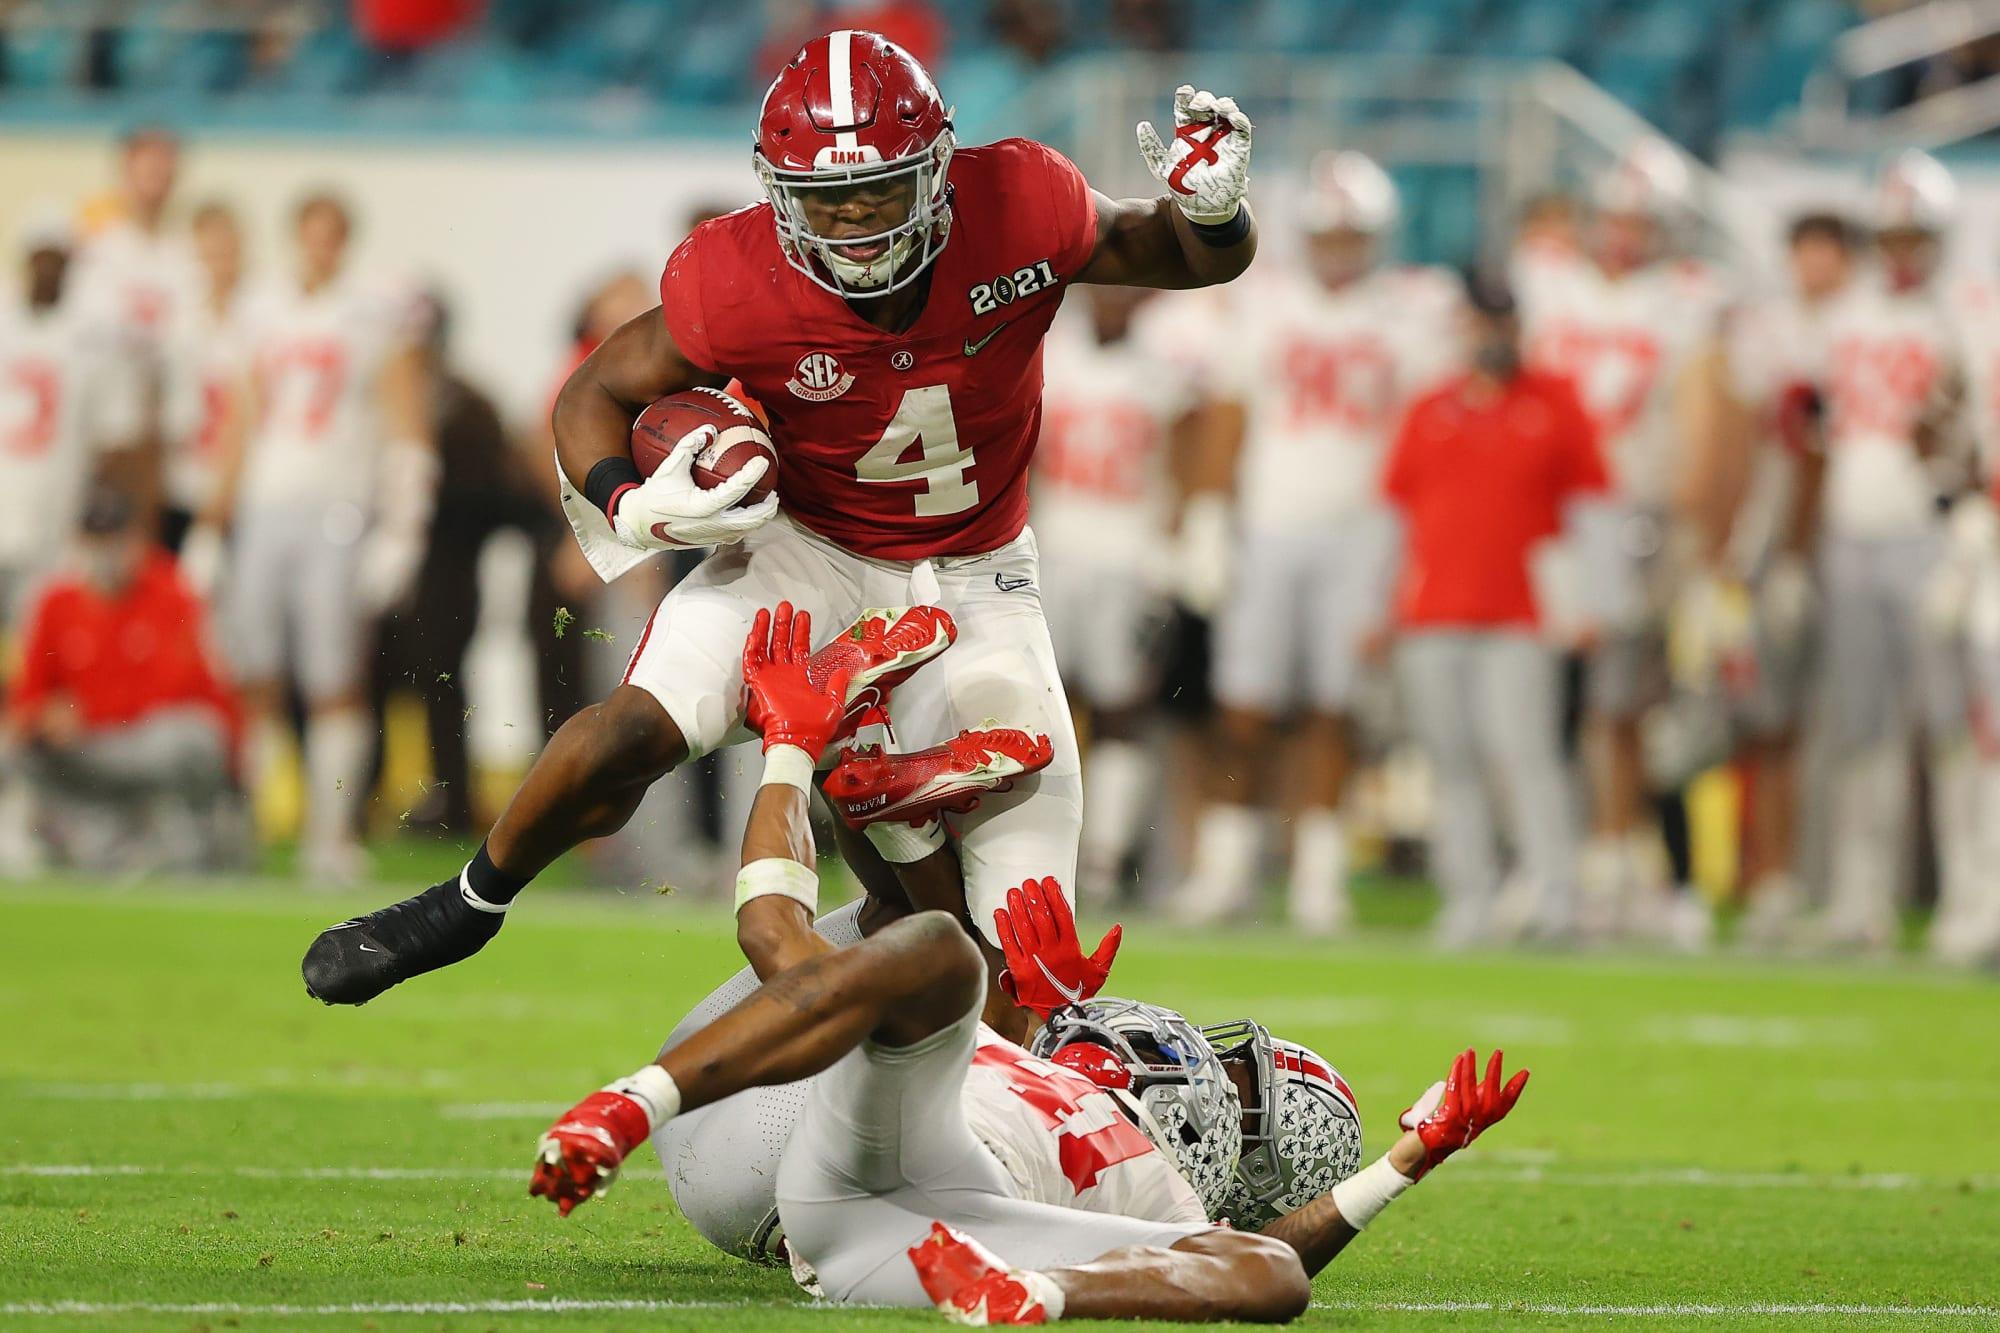 Alabama Football: Predicting 2021 RB distributions - BamaHammer